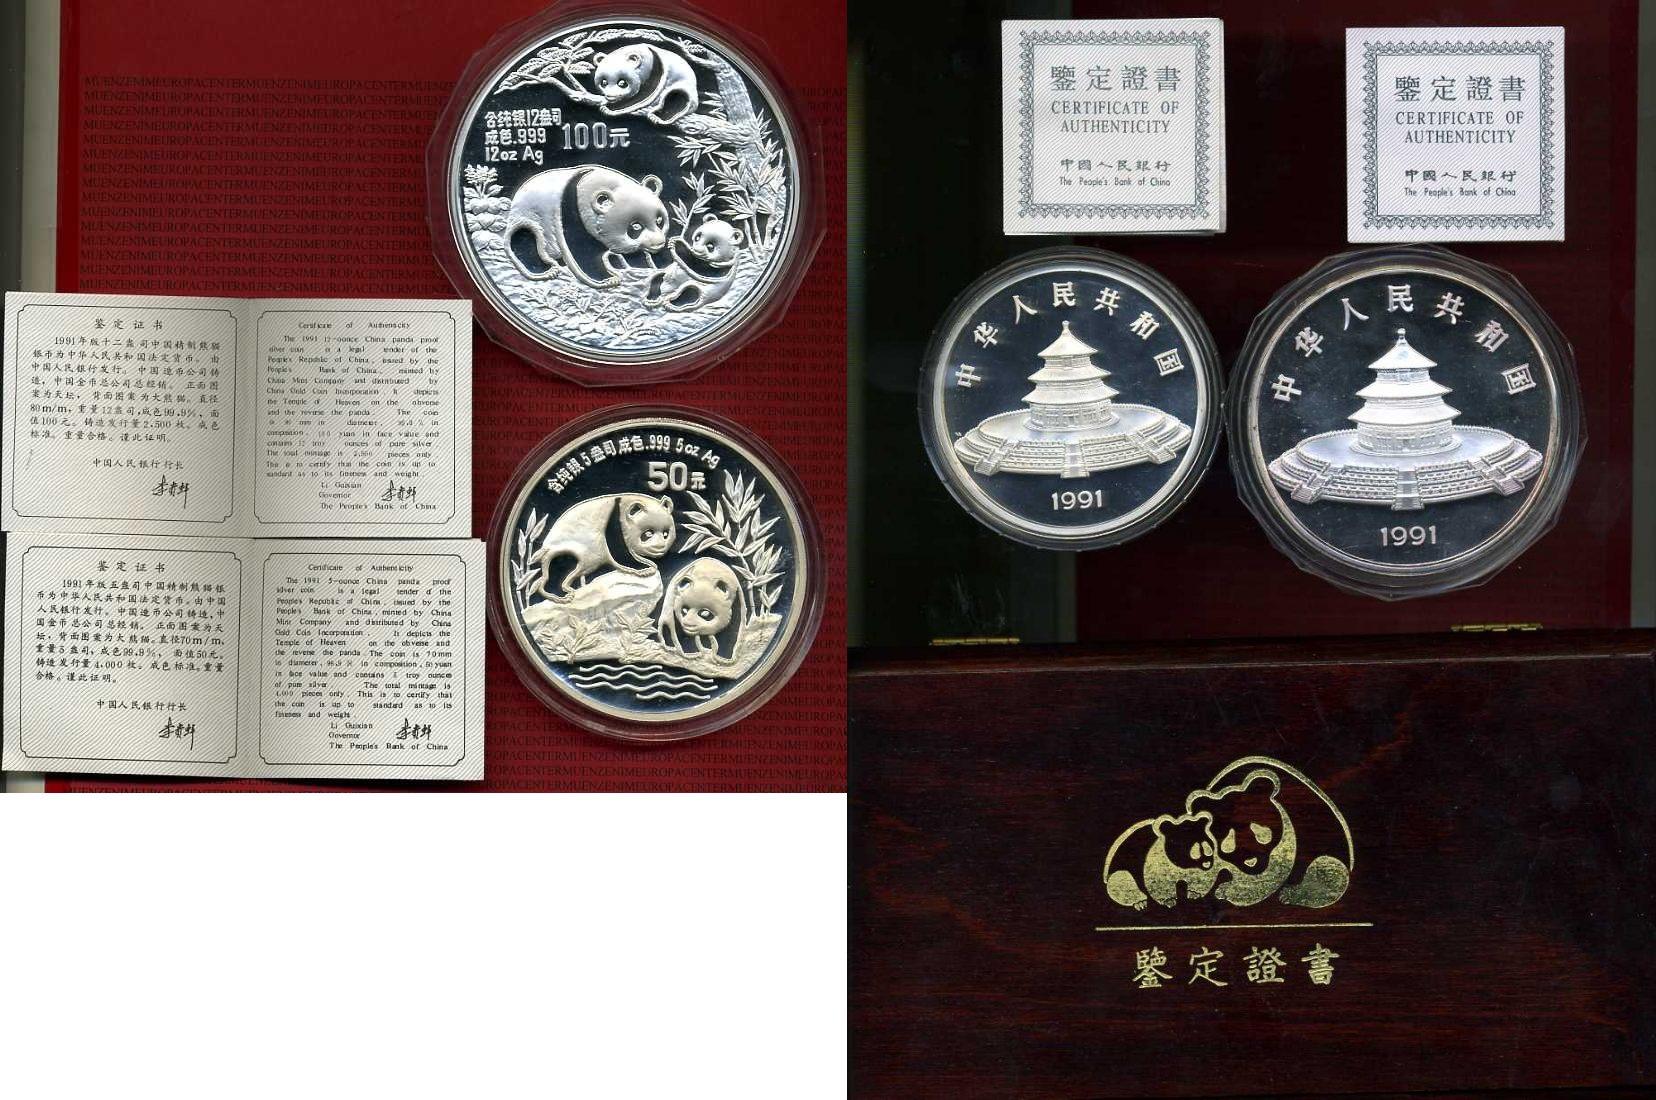 50 und 100 Yuan Silbermünzen Set 1991 China Set China 50 and 100 Yuan 5 and 12 Ounces Panda 1991 Proof w Box and COA proof w. wooden box coa